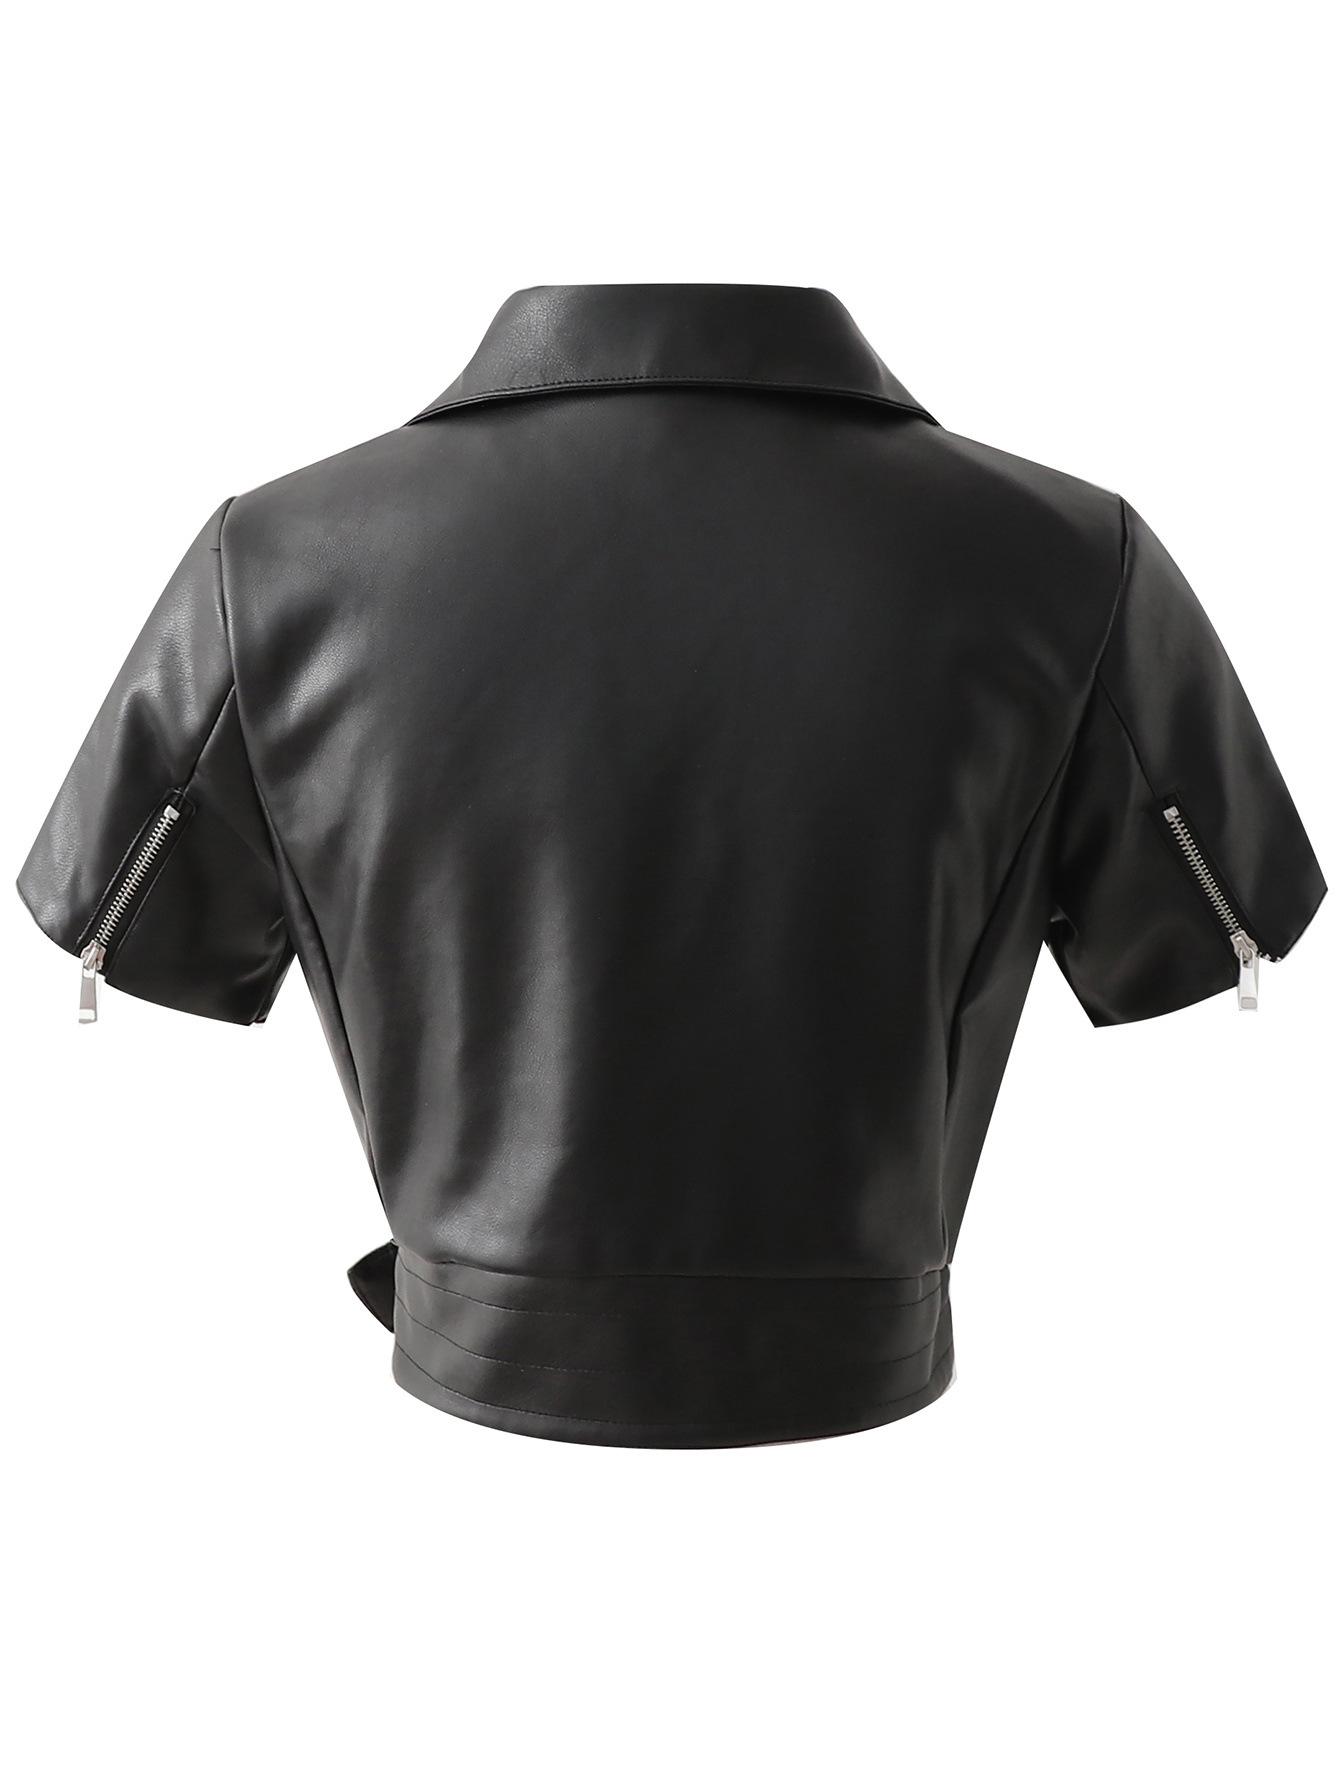 wholesale women's new short multi-zip leather jacket  NSAM4230